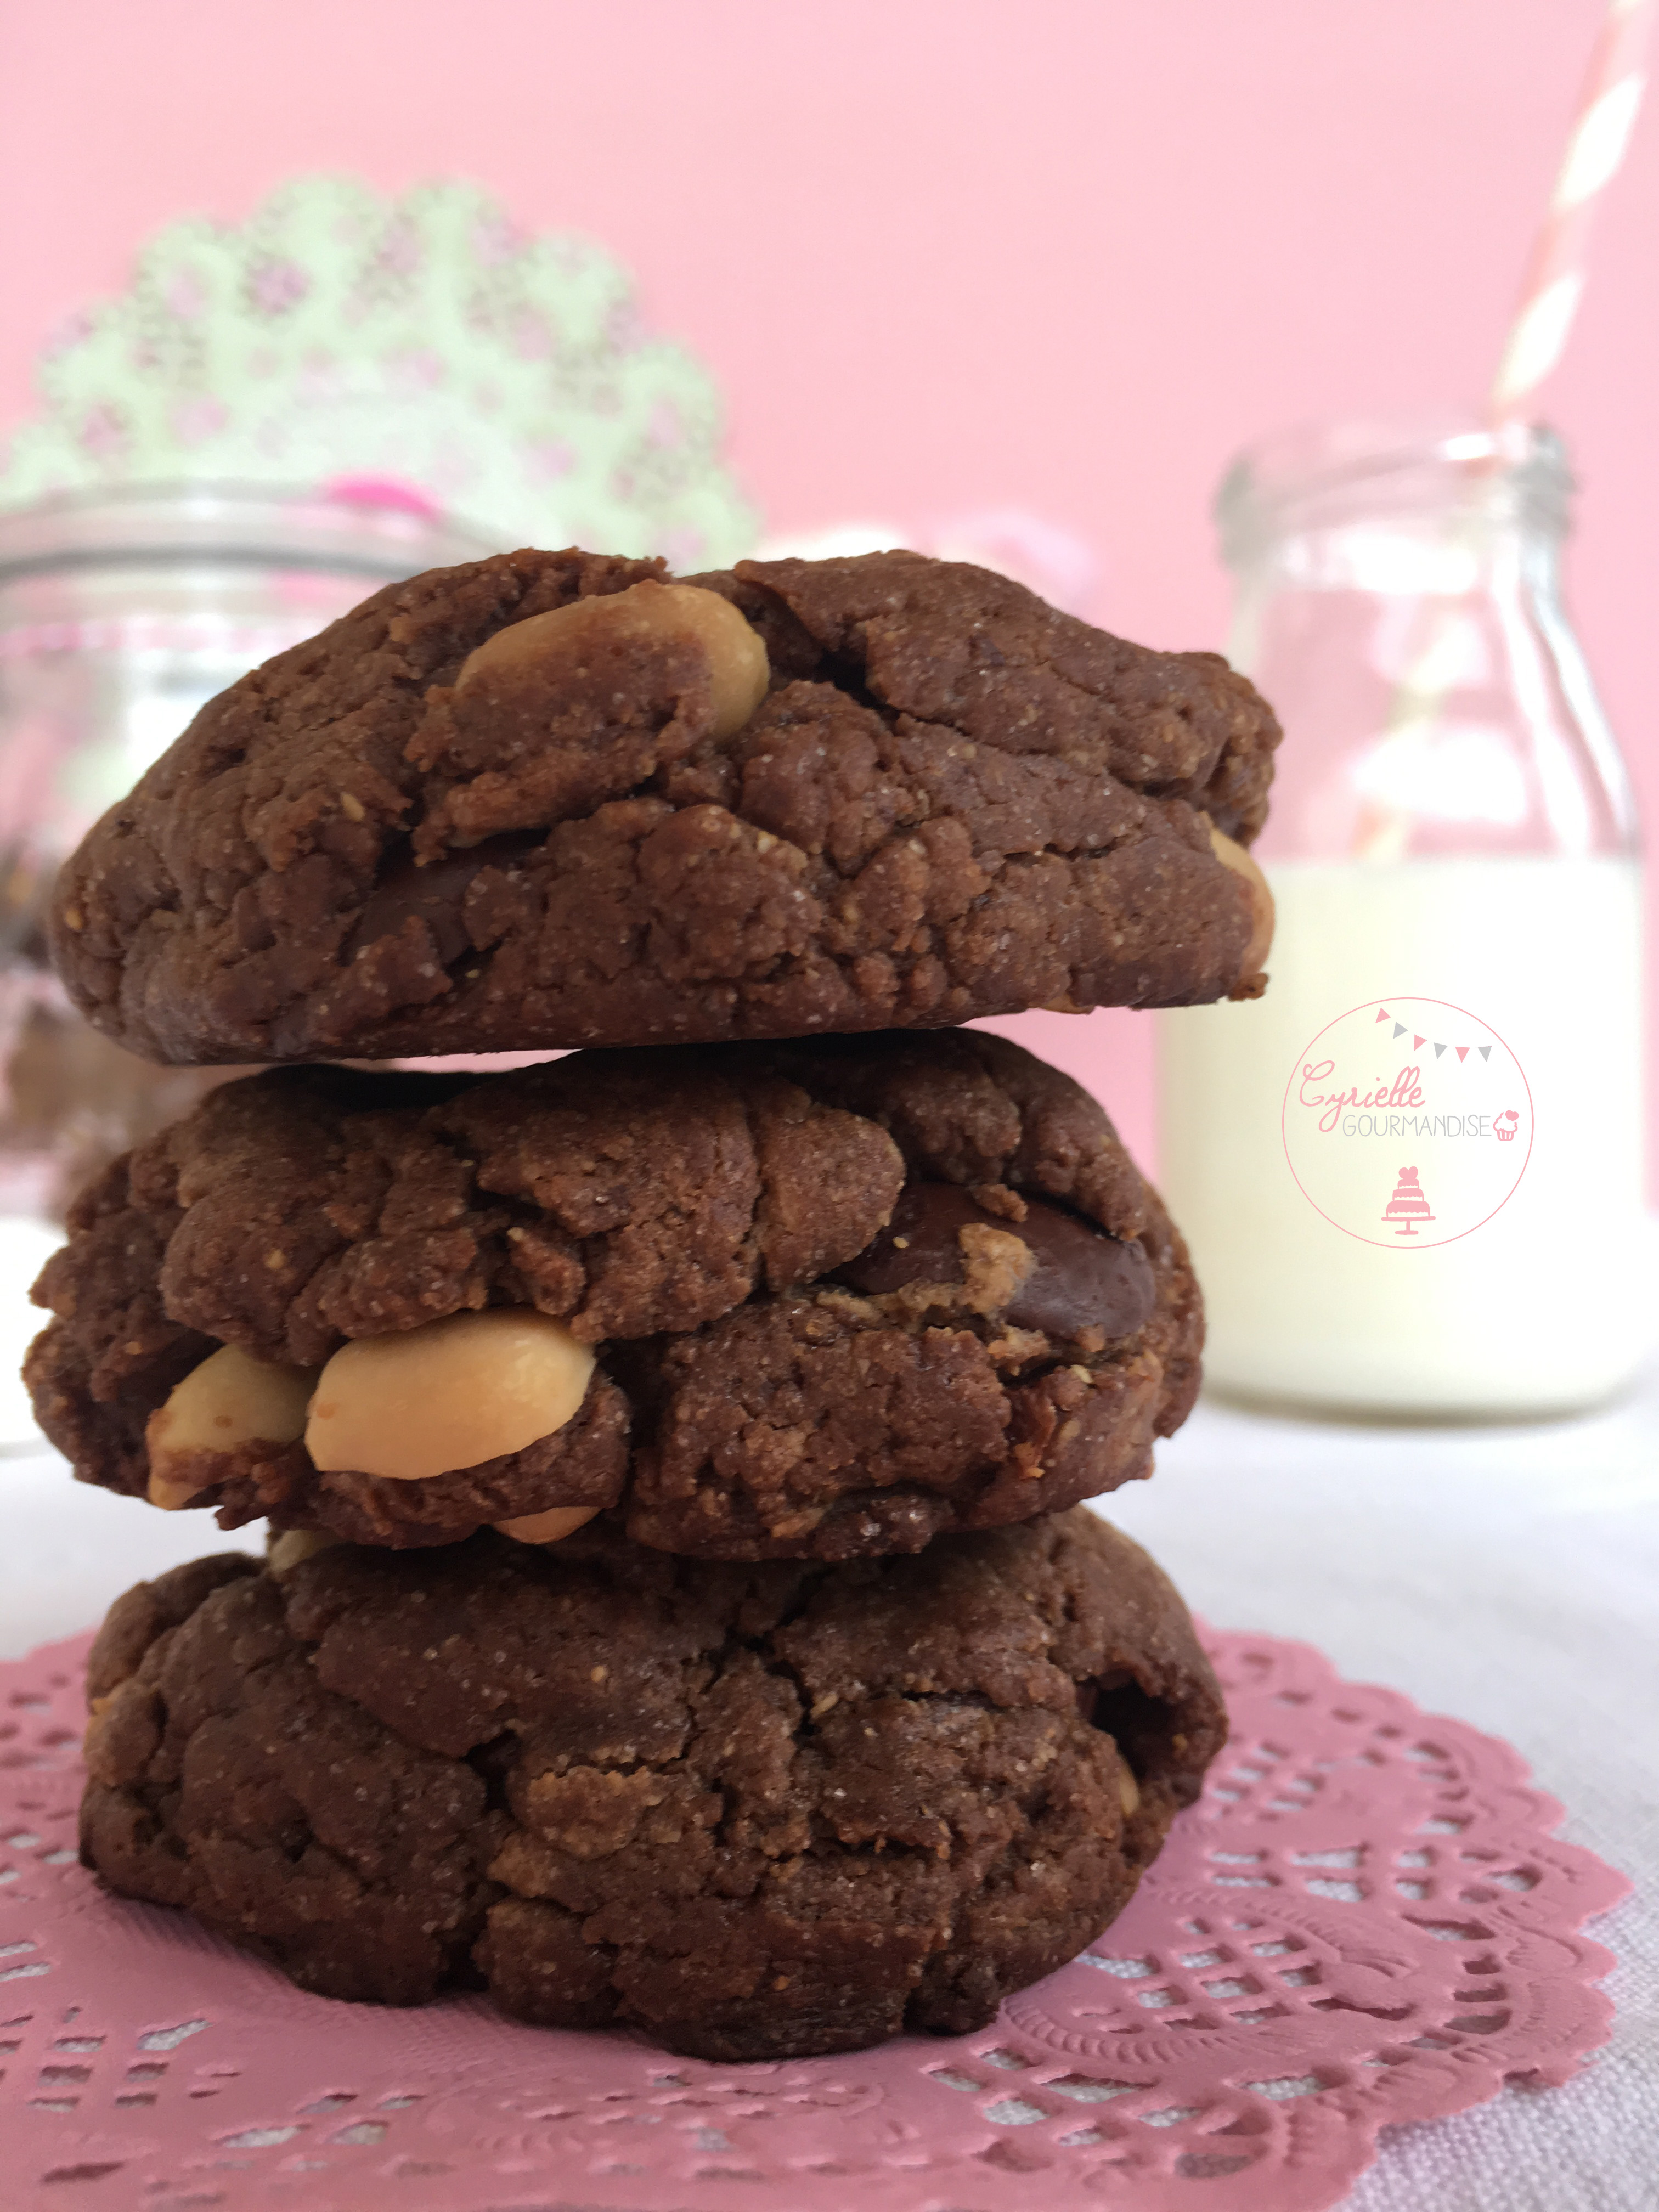 Cookies Chocolat Beurre de Cacahuète 3